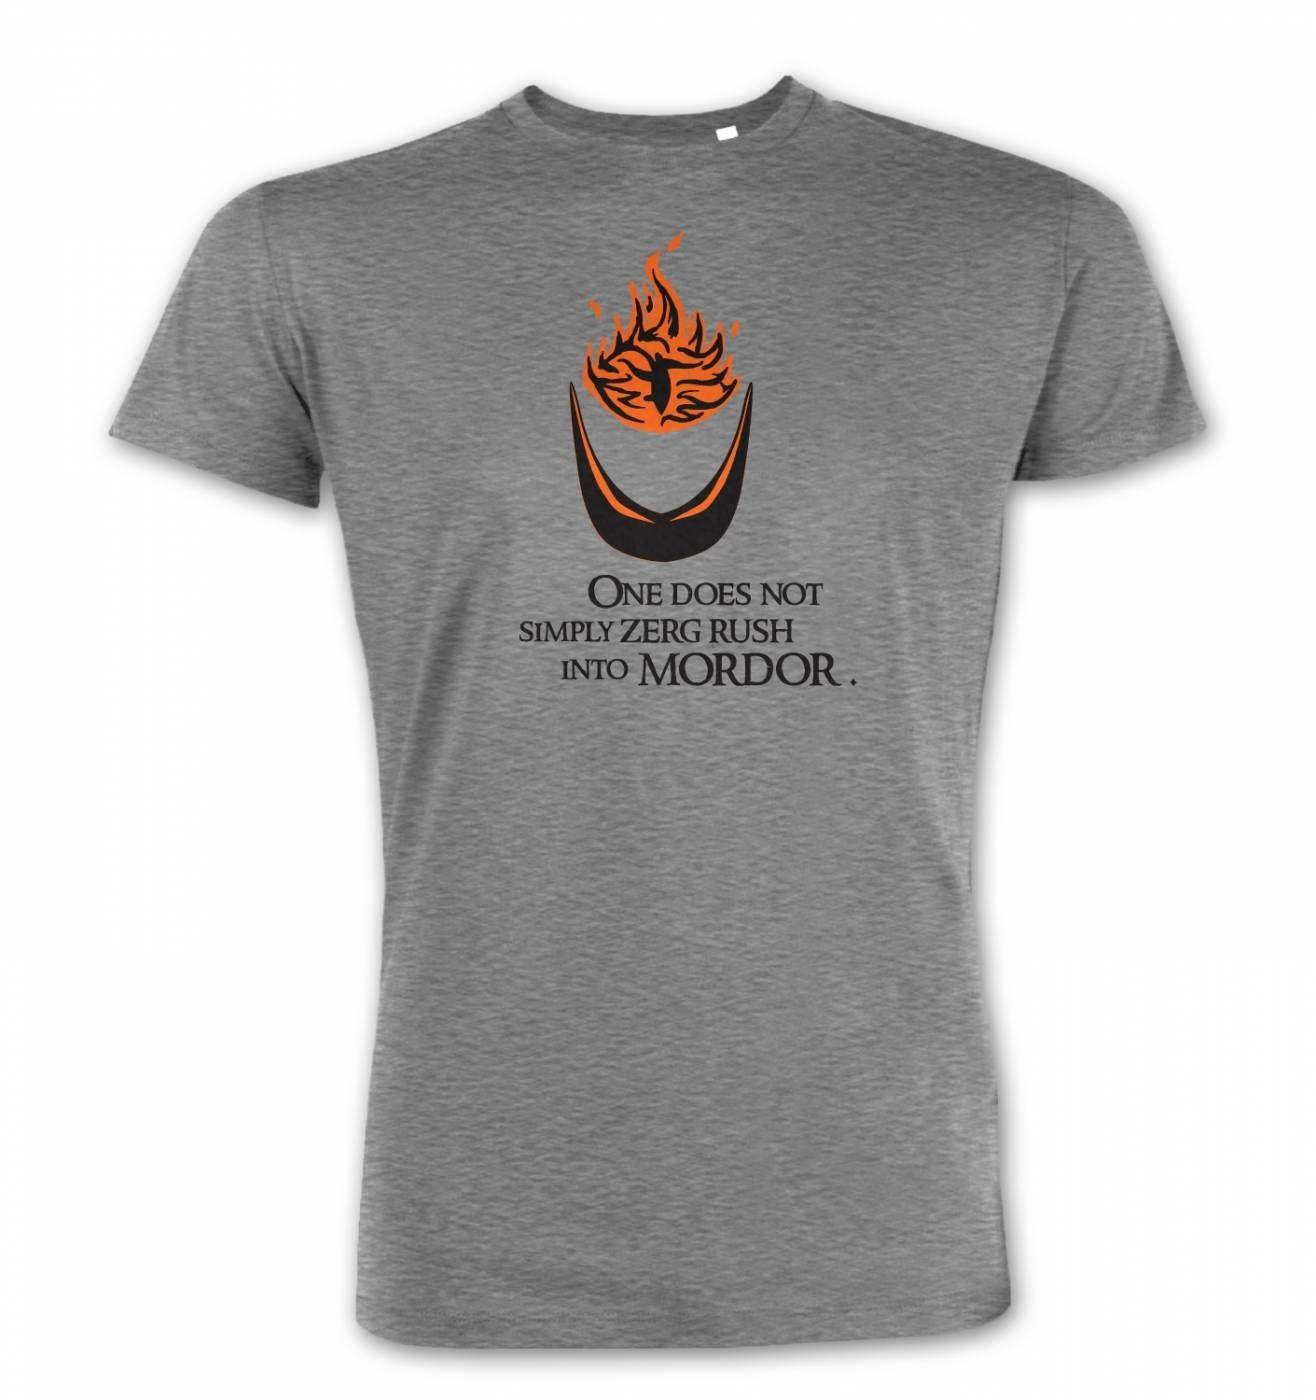 Zerg Rush into Mordor Premium t-shirt